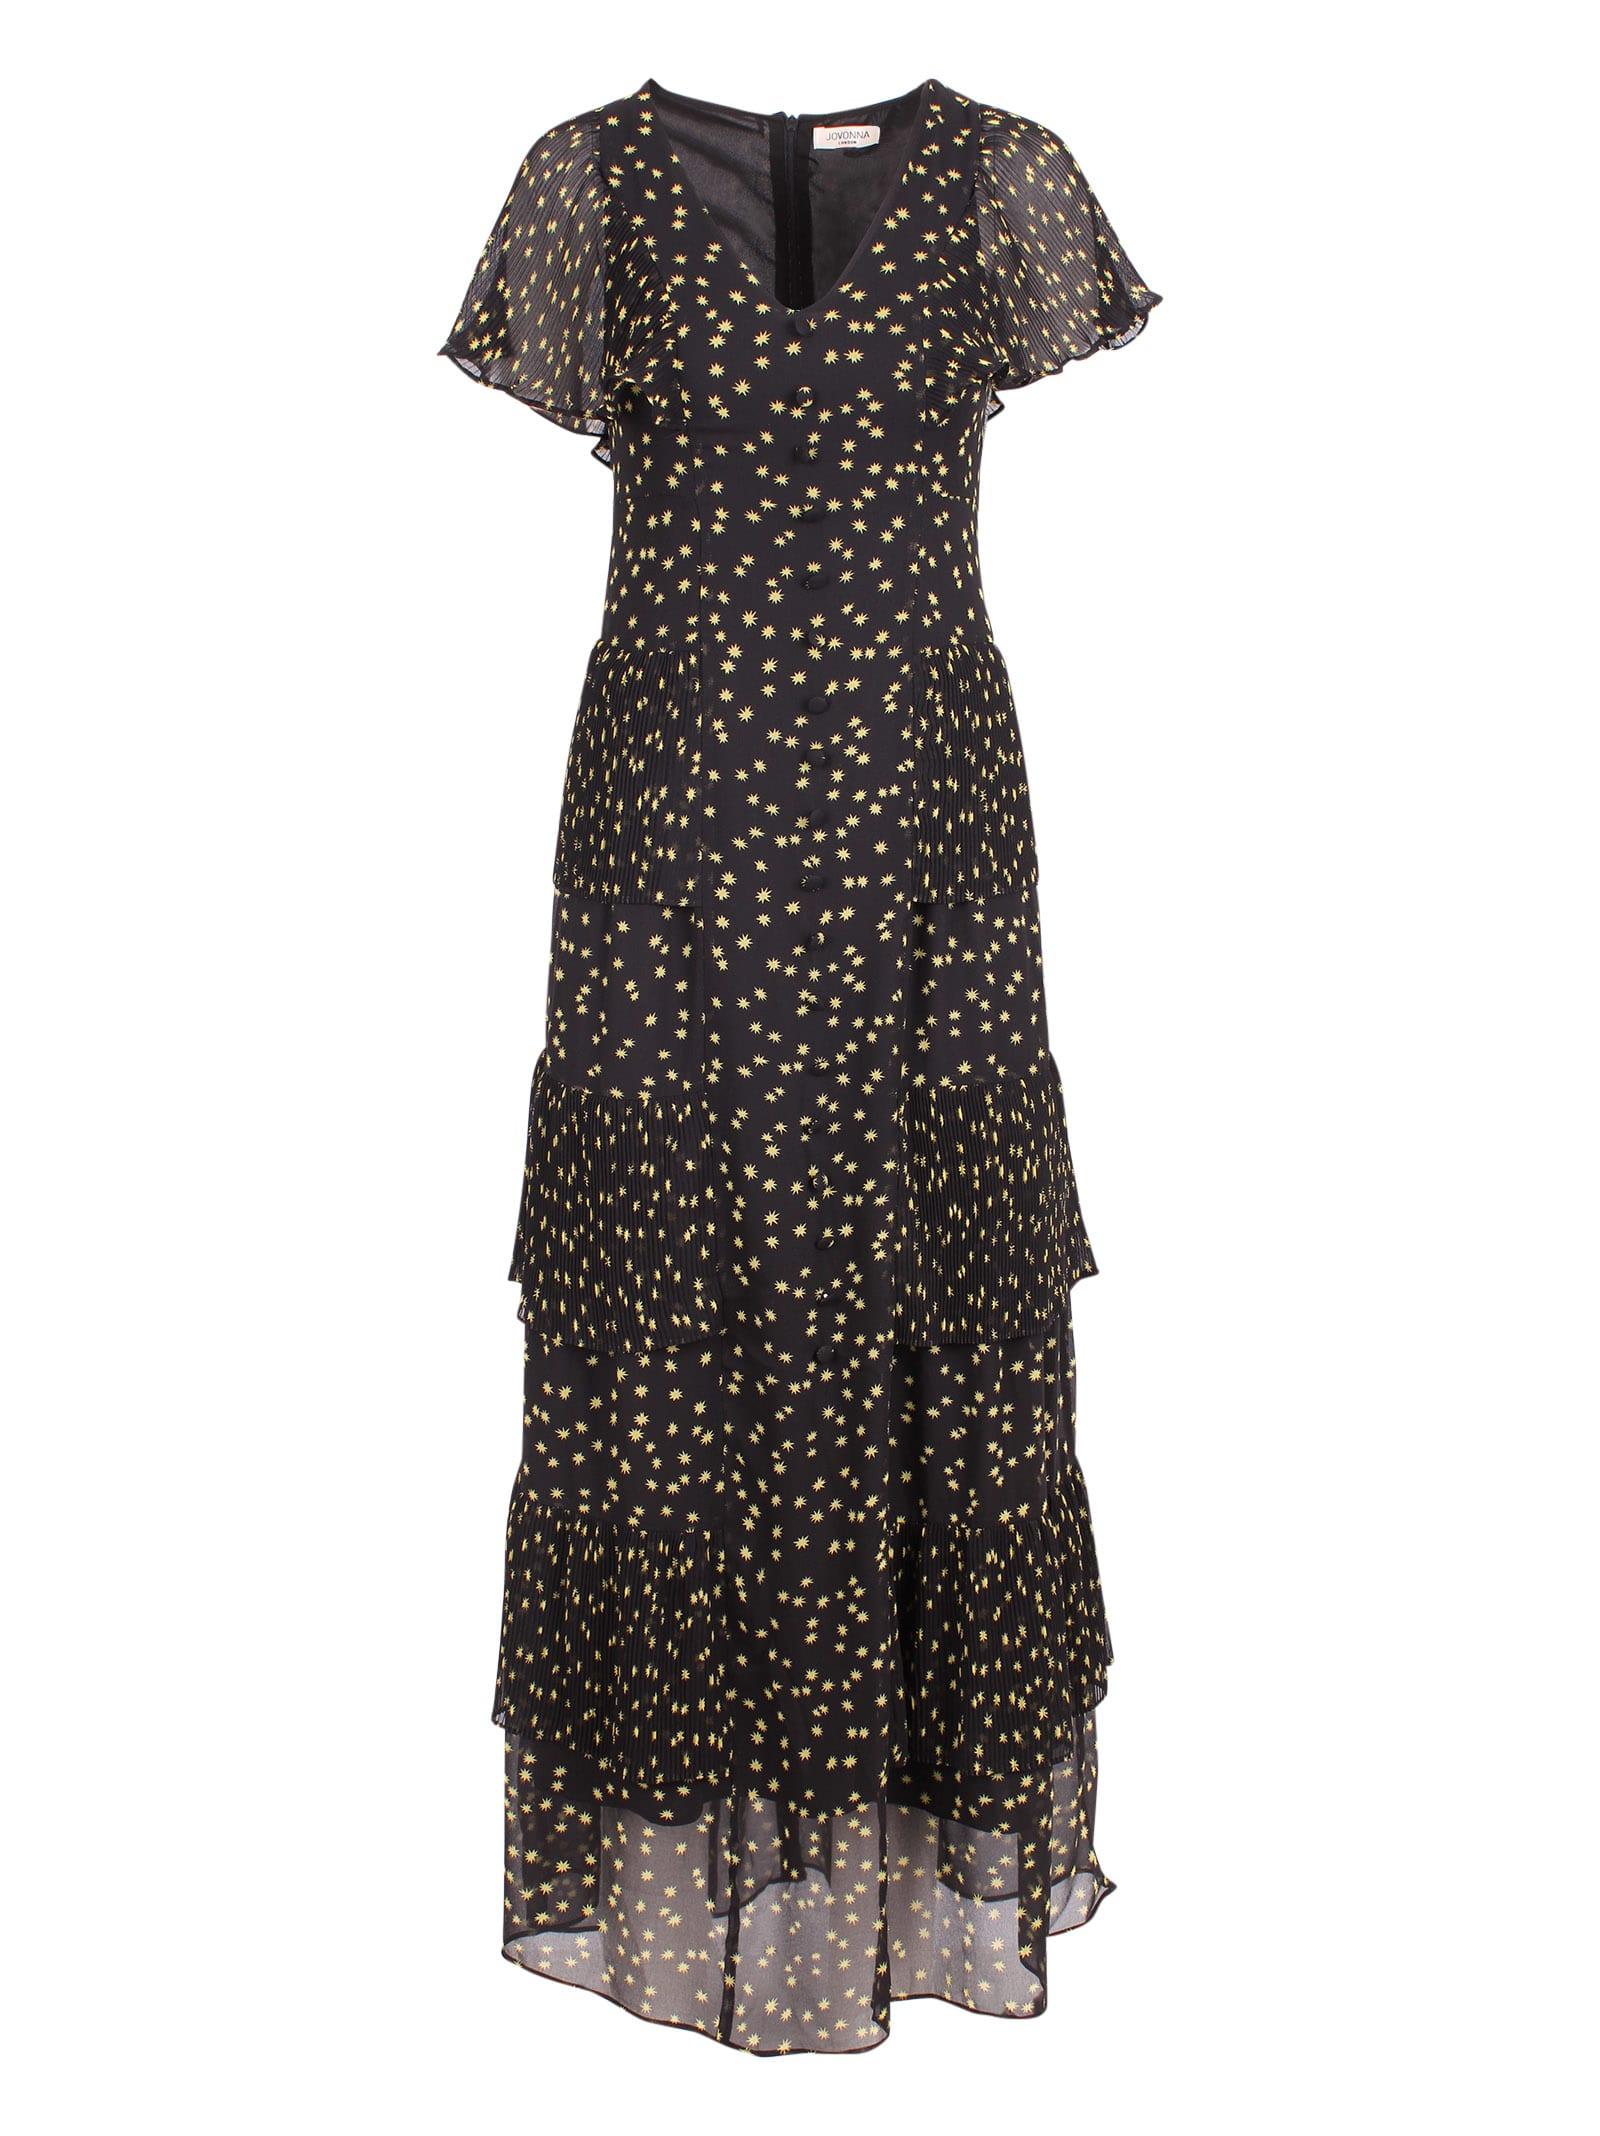 London vita Polyester Dress